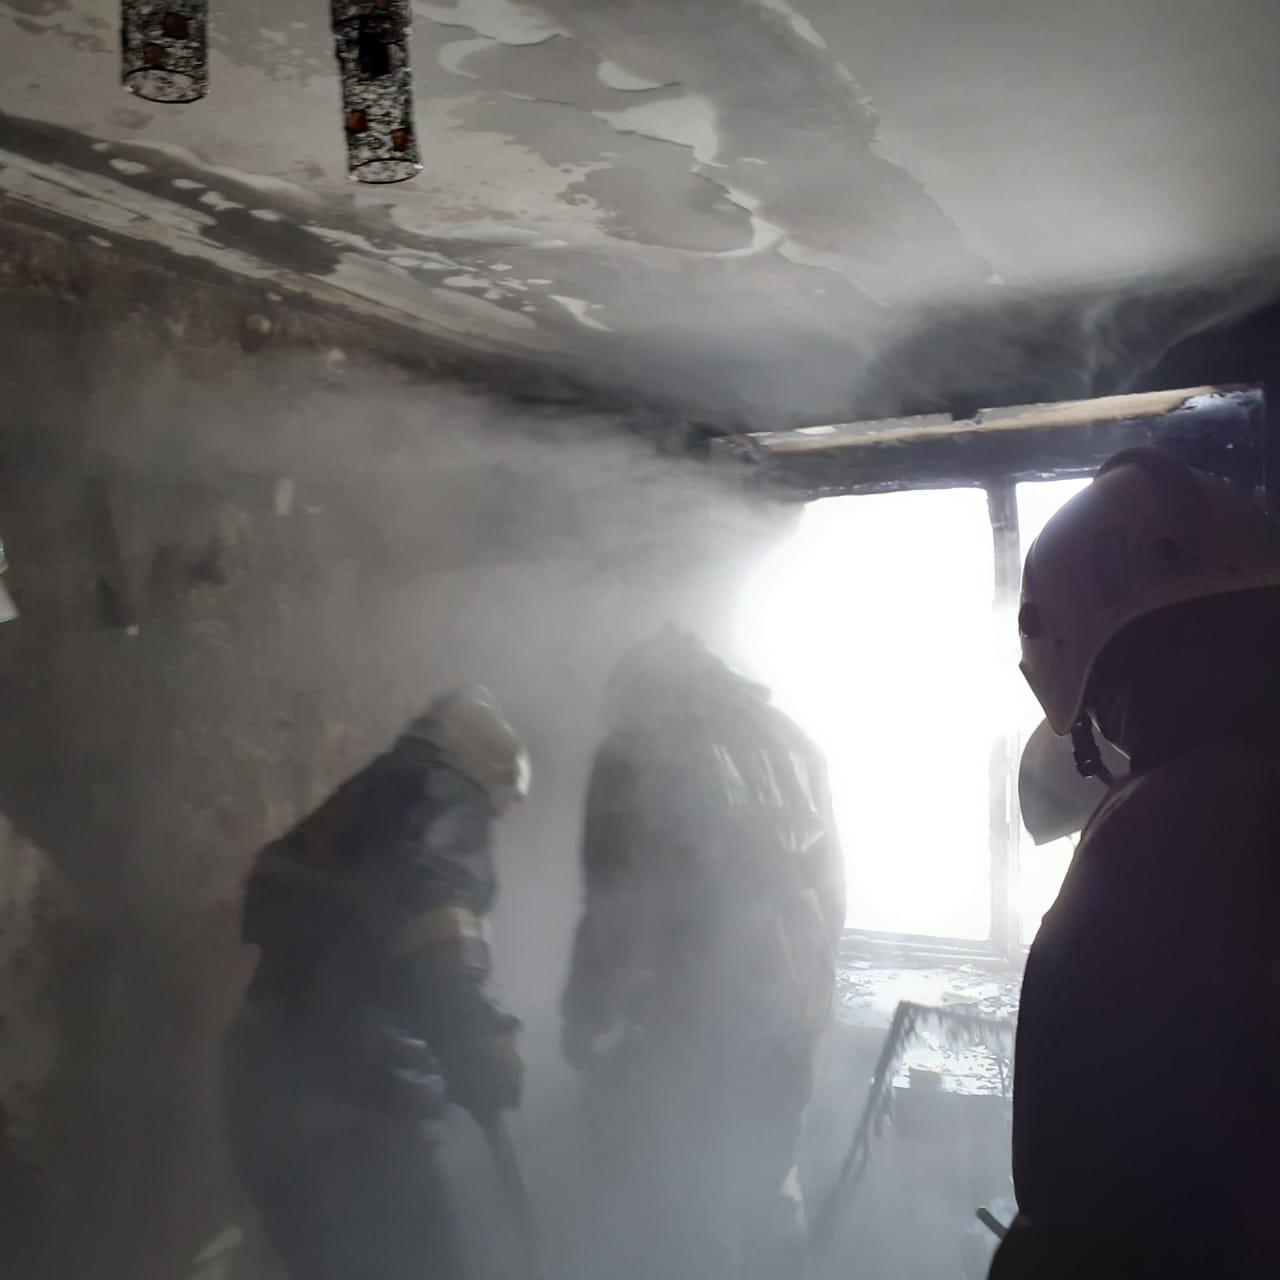 Пенсионерка погибла при пожаре в Петропавловске, фото-2